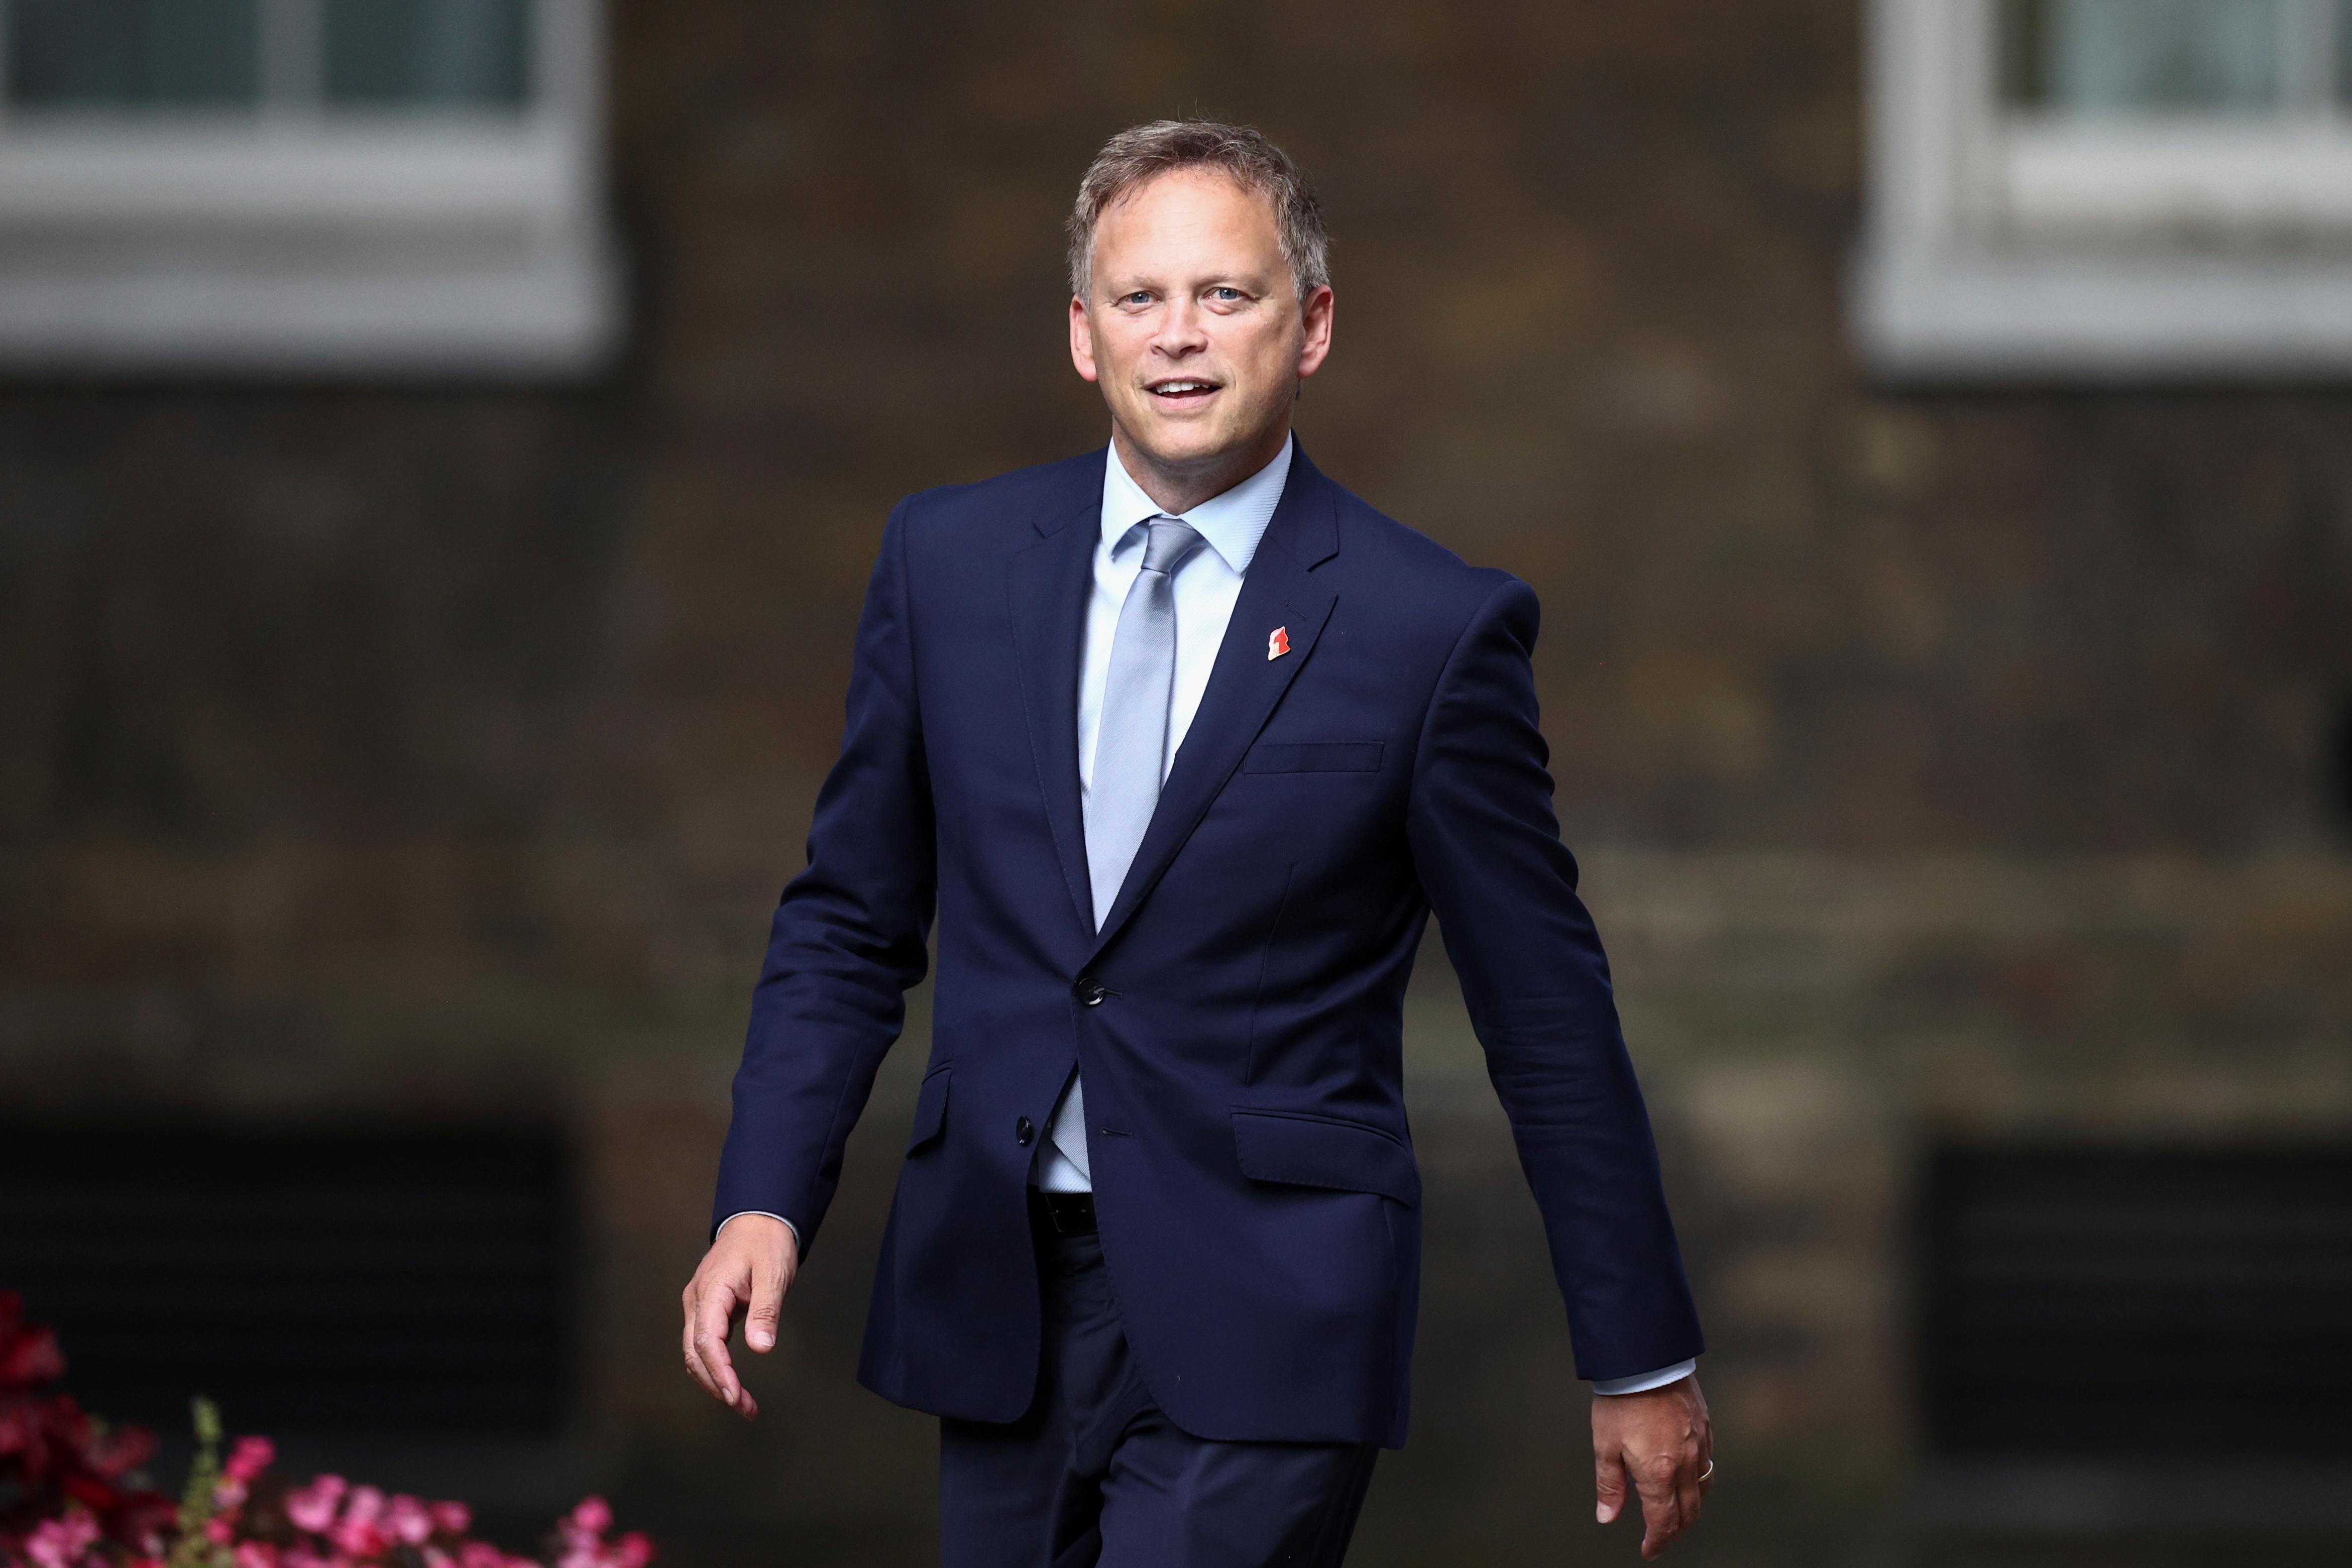 Britain's Transport Secretary Grant Shapps walks outside Downing Street in London, Britain, September 15, 2021. REUTERS/Hannah McKay